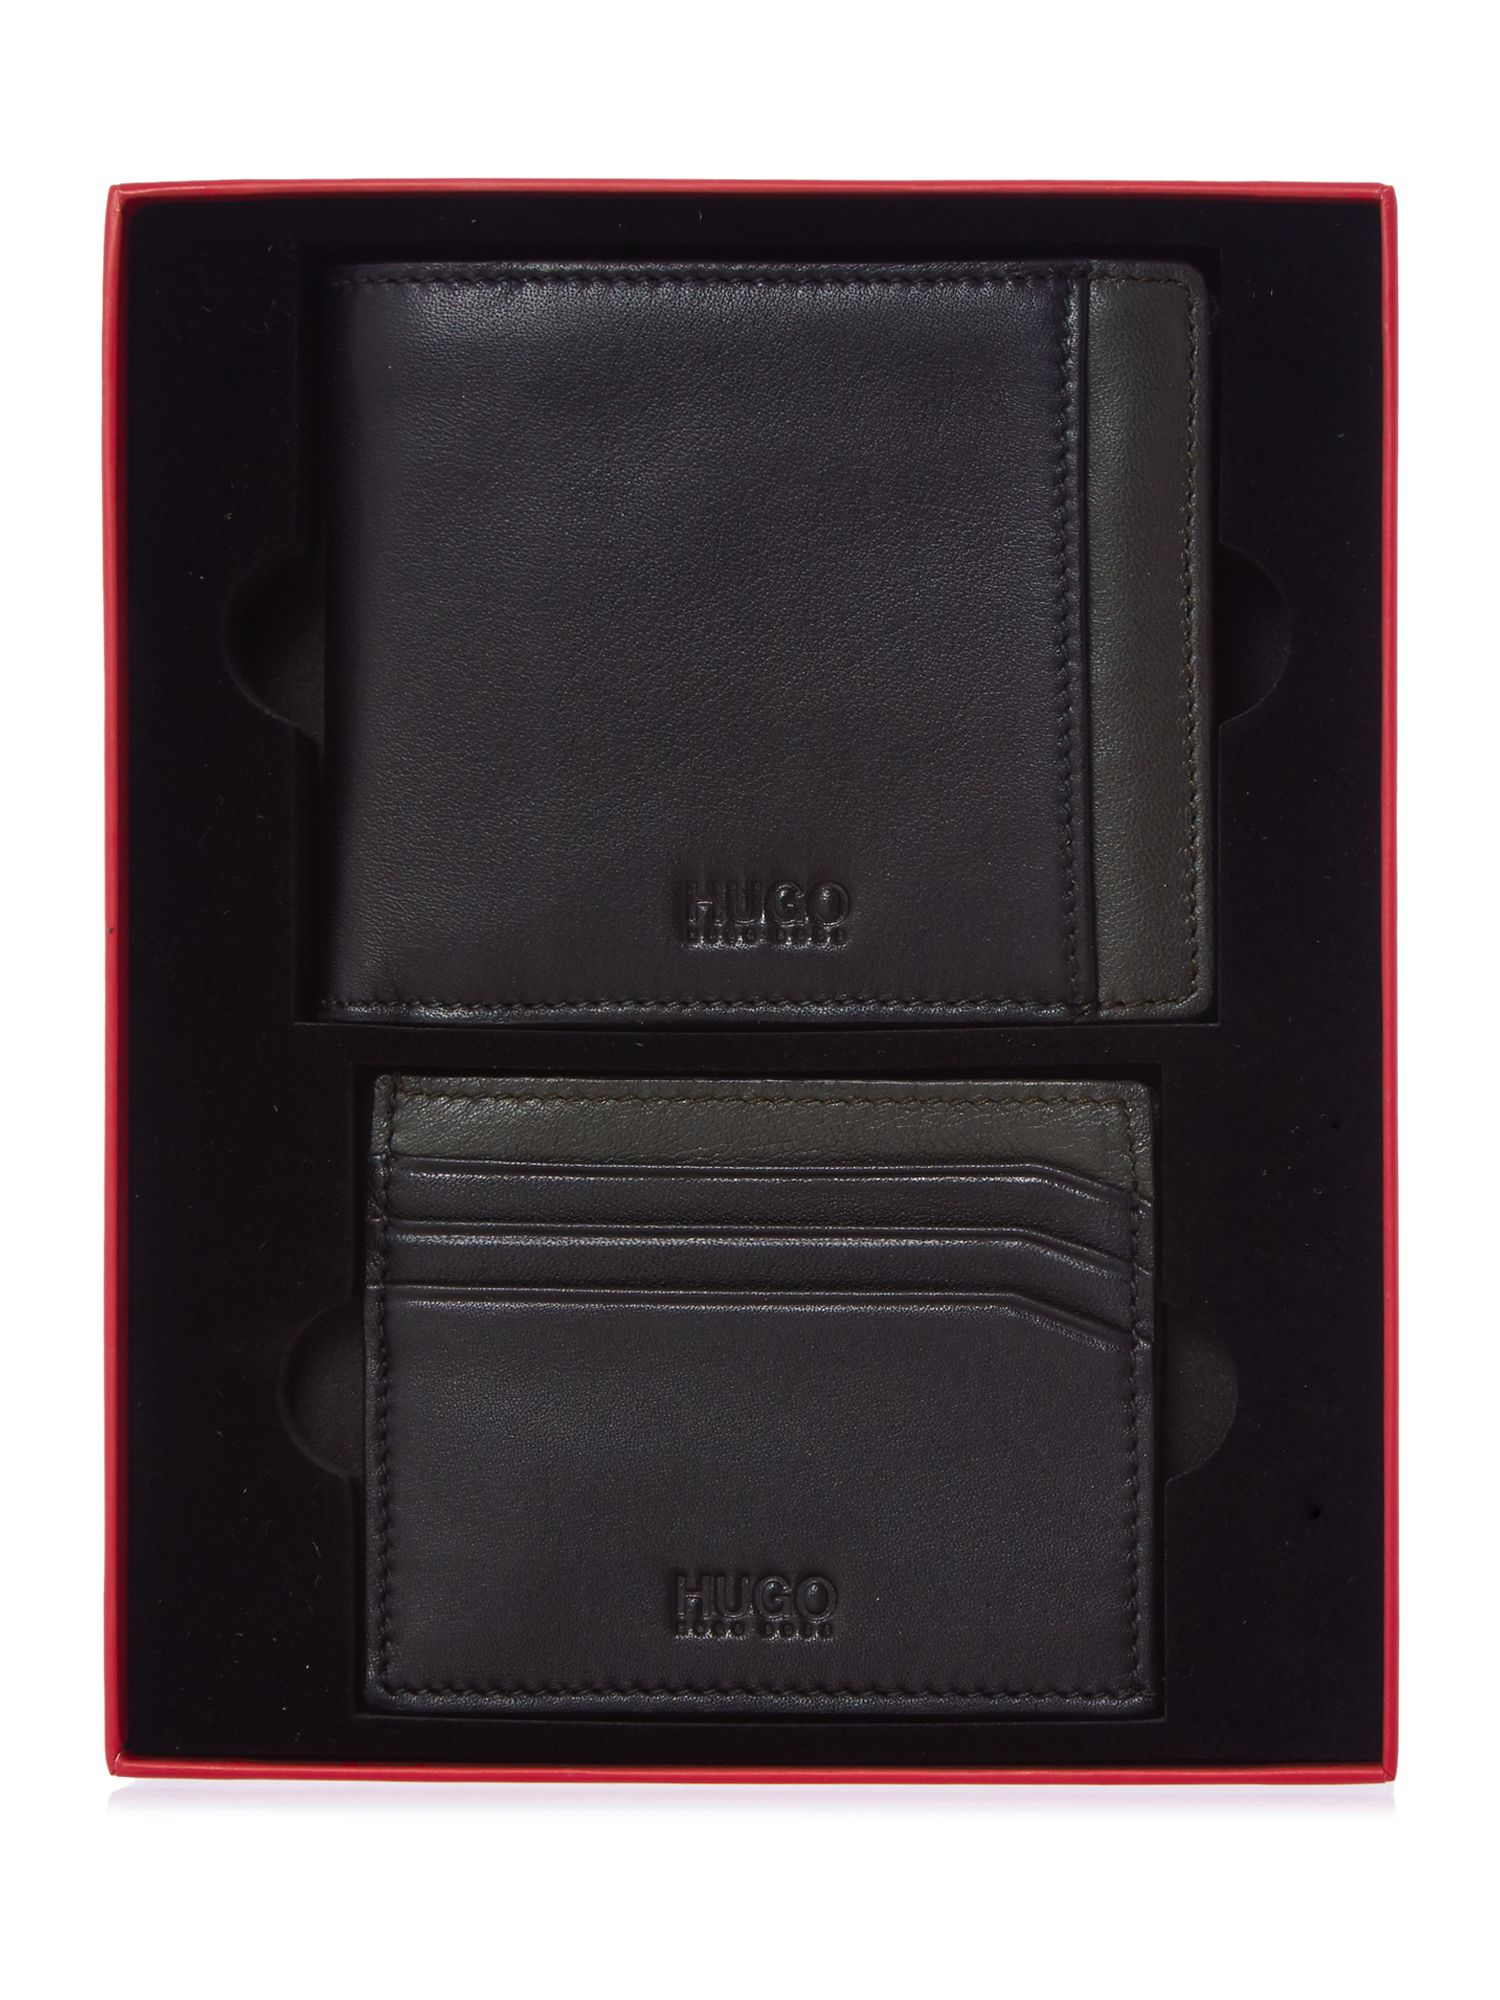 Hugo boss card holder wallet wallet design hugo boss business card holder choice image business card template colourmoves